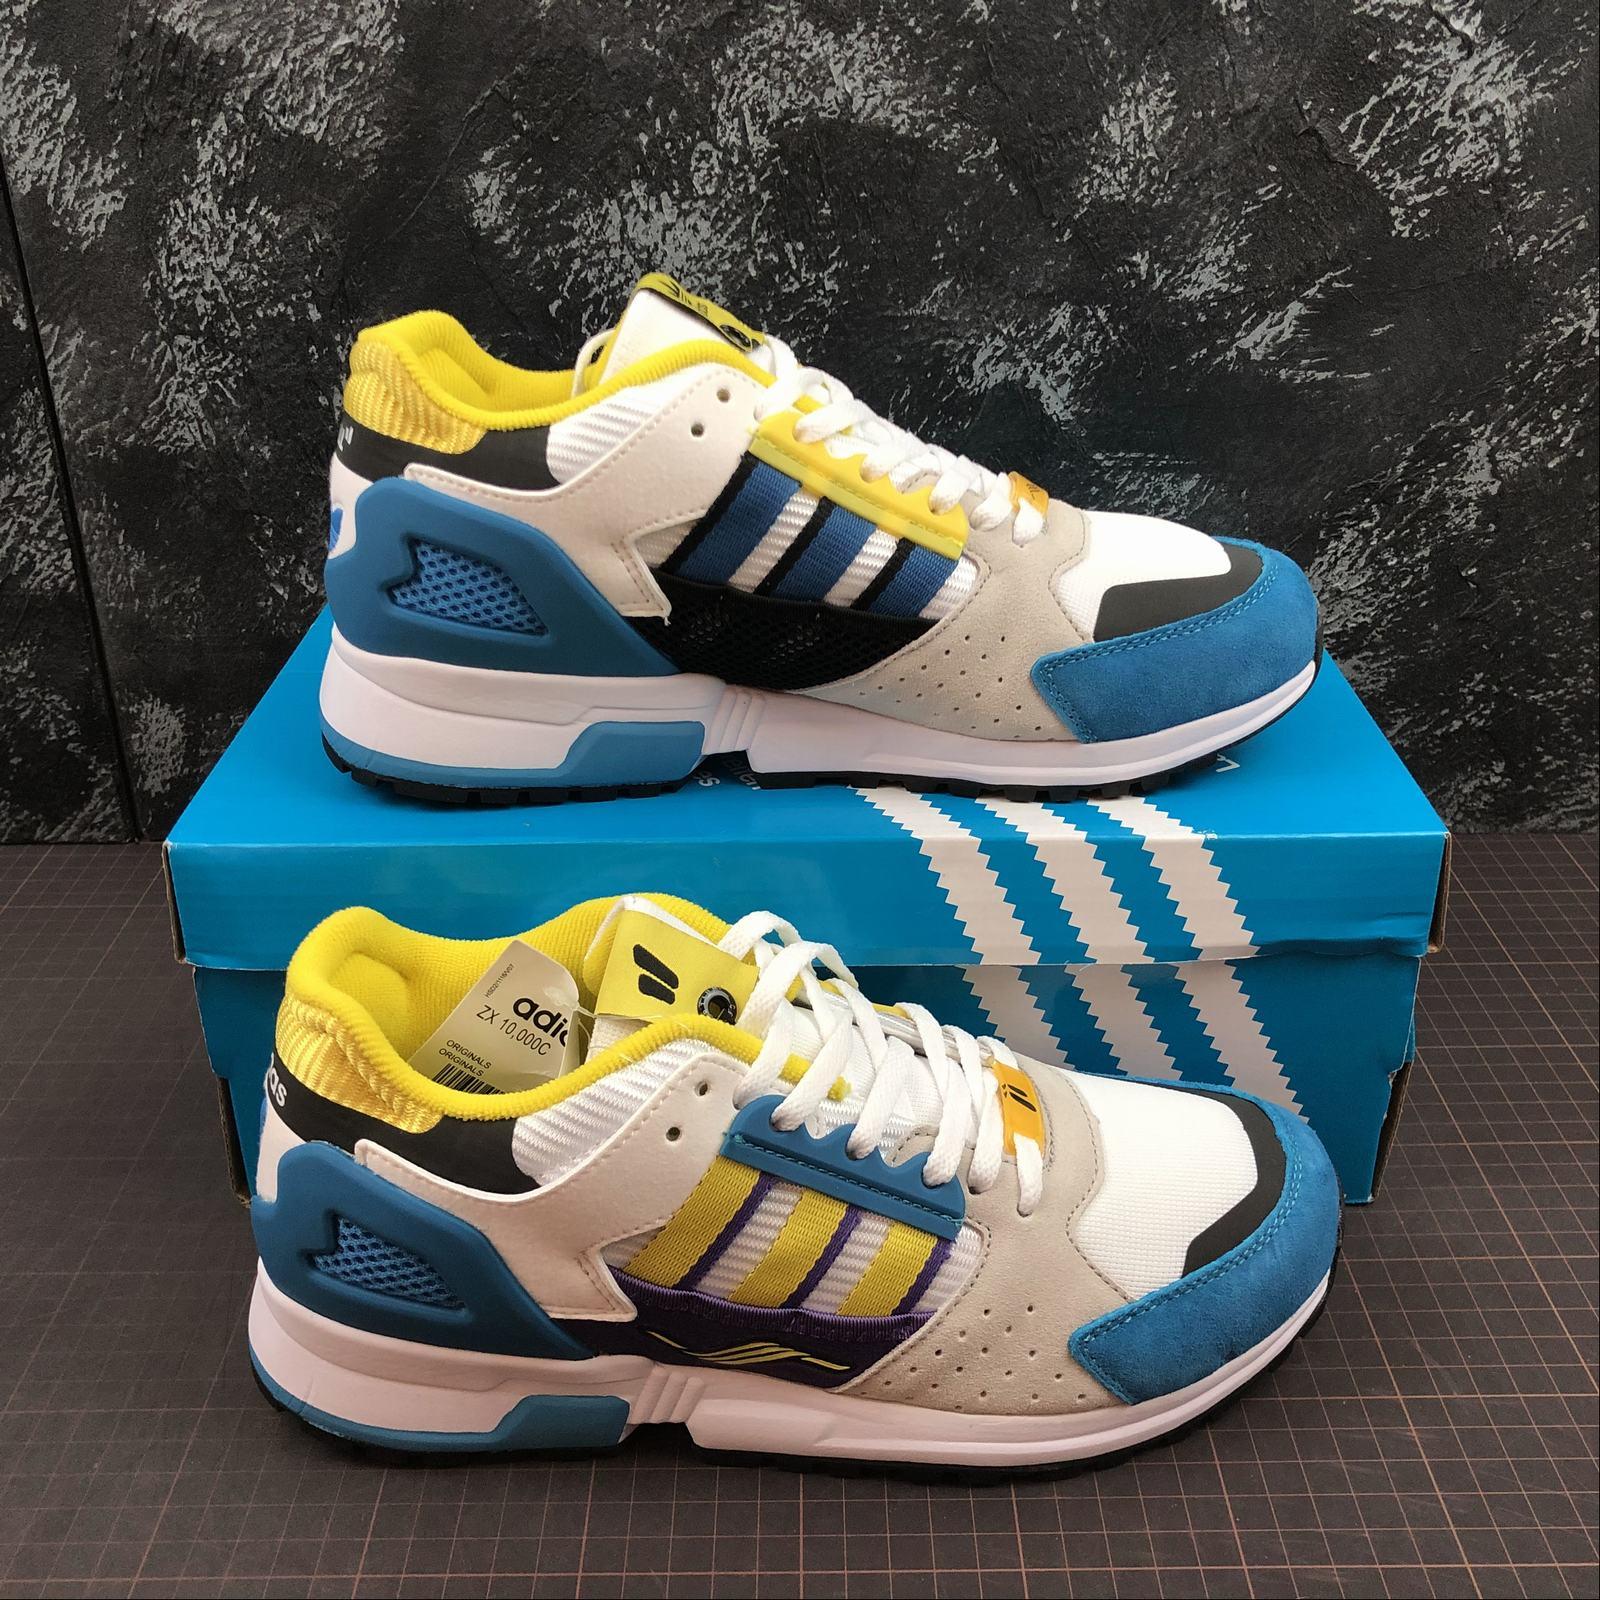 giay-sneaker-adidas-zx10000-c-ee9489